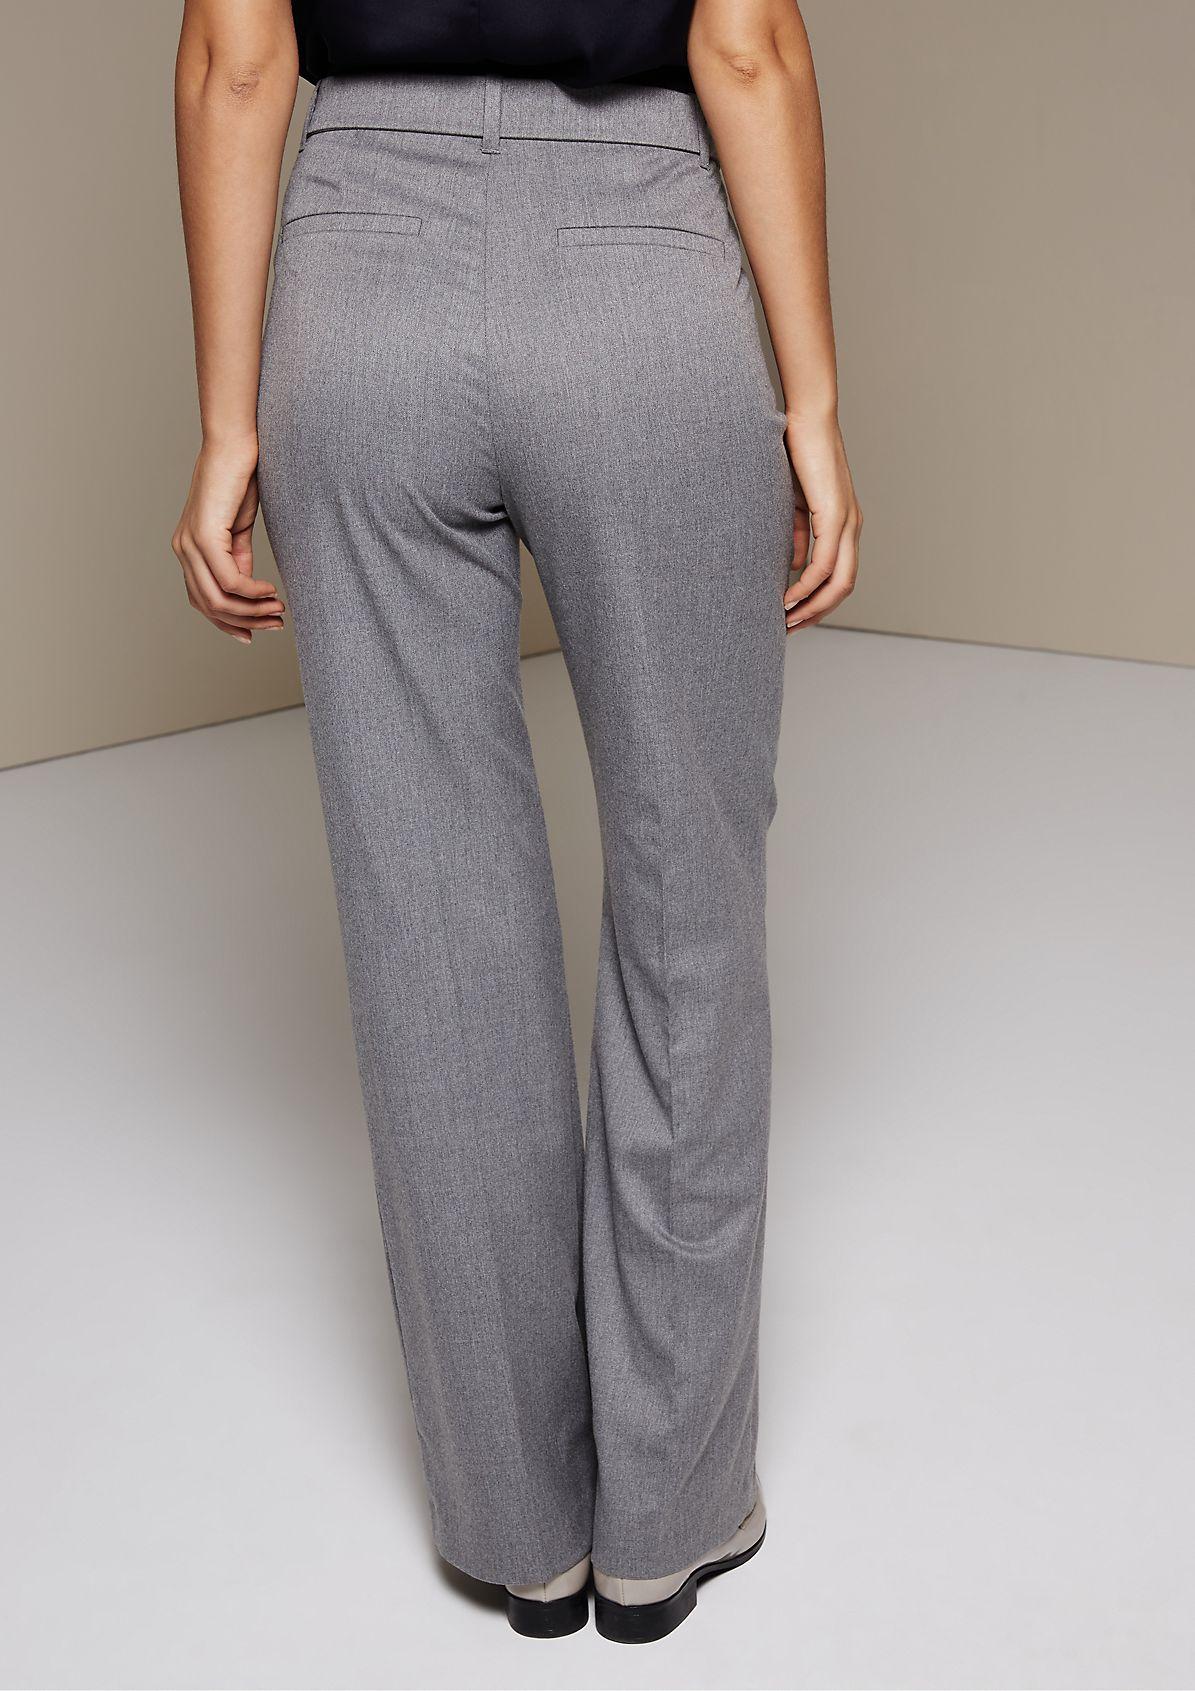 Edle Businesspants mit breitem Stoffgürtel